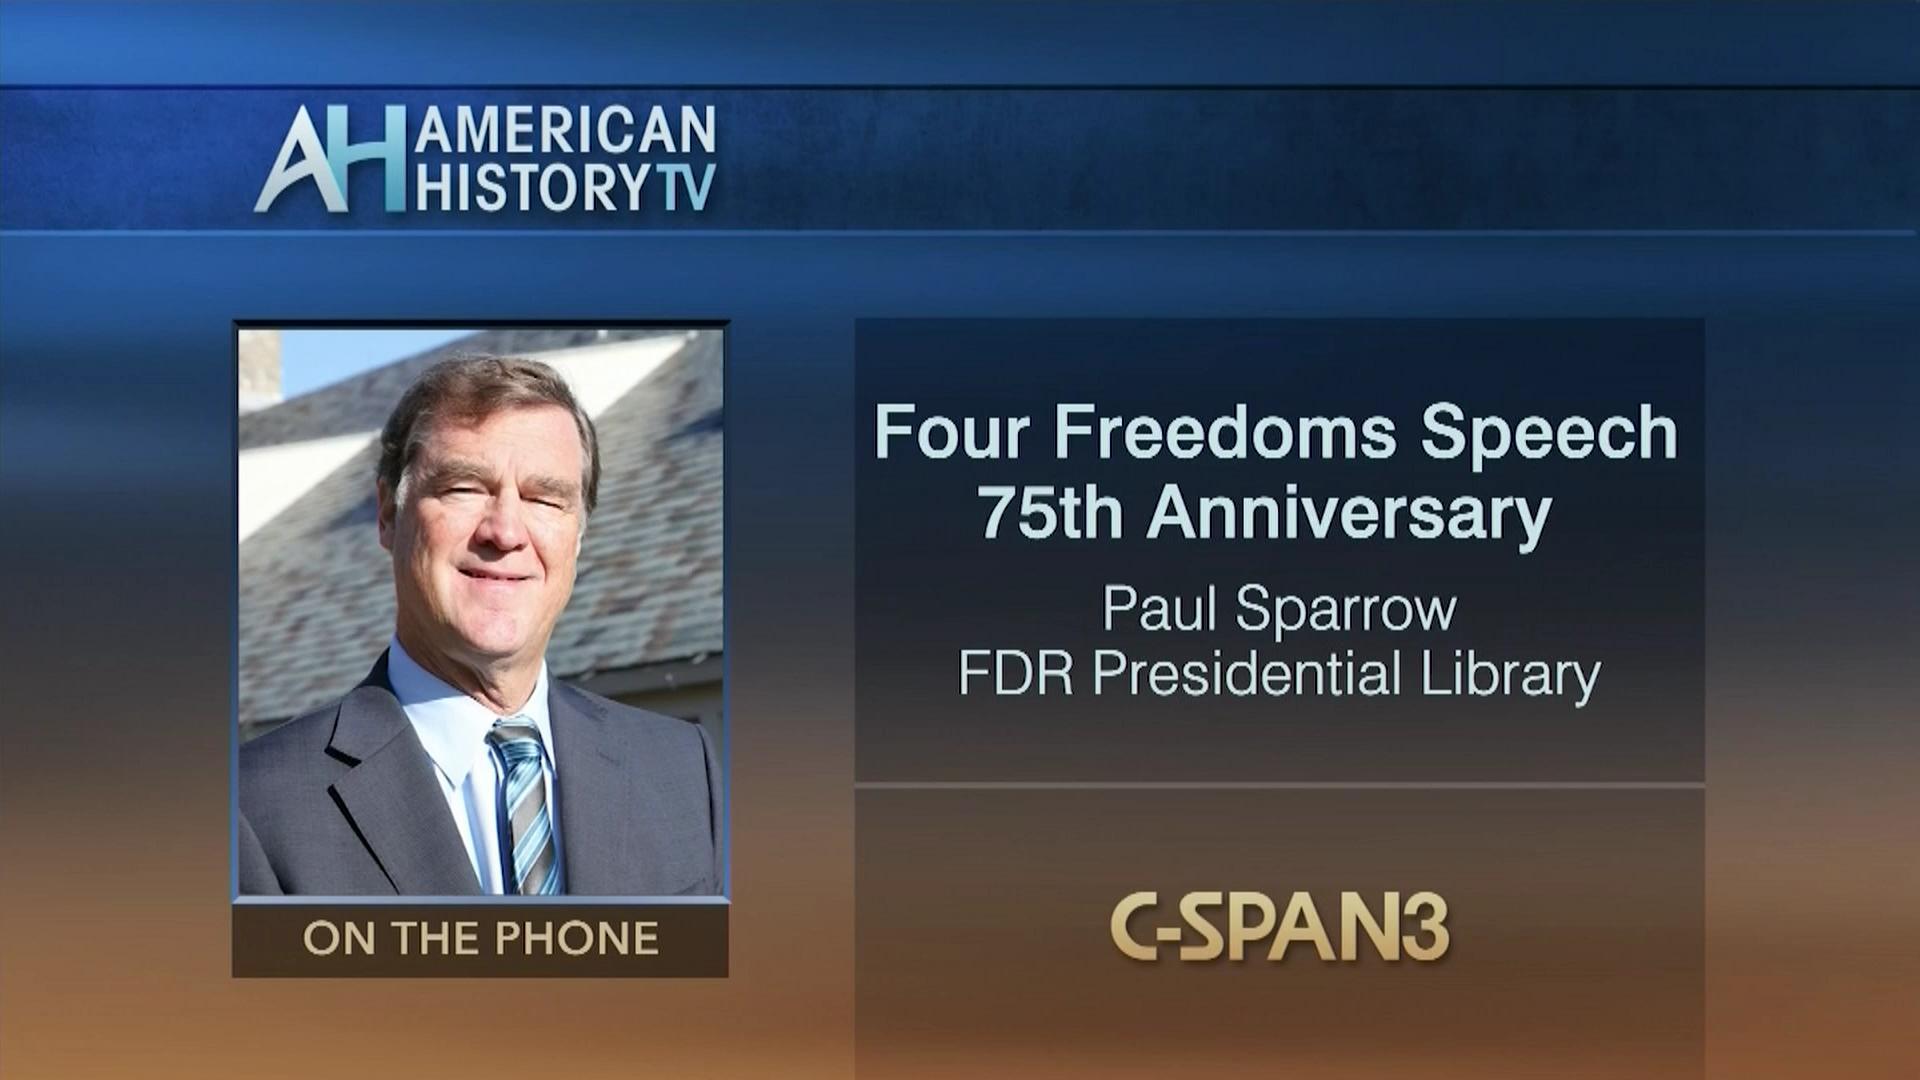 President Franklin Roosevelt 's Four Freedoms Speech 75th Anniversary